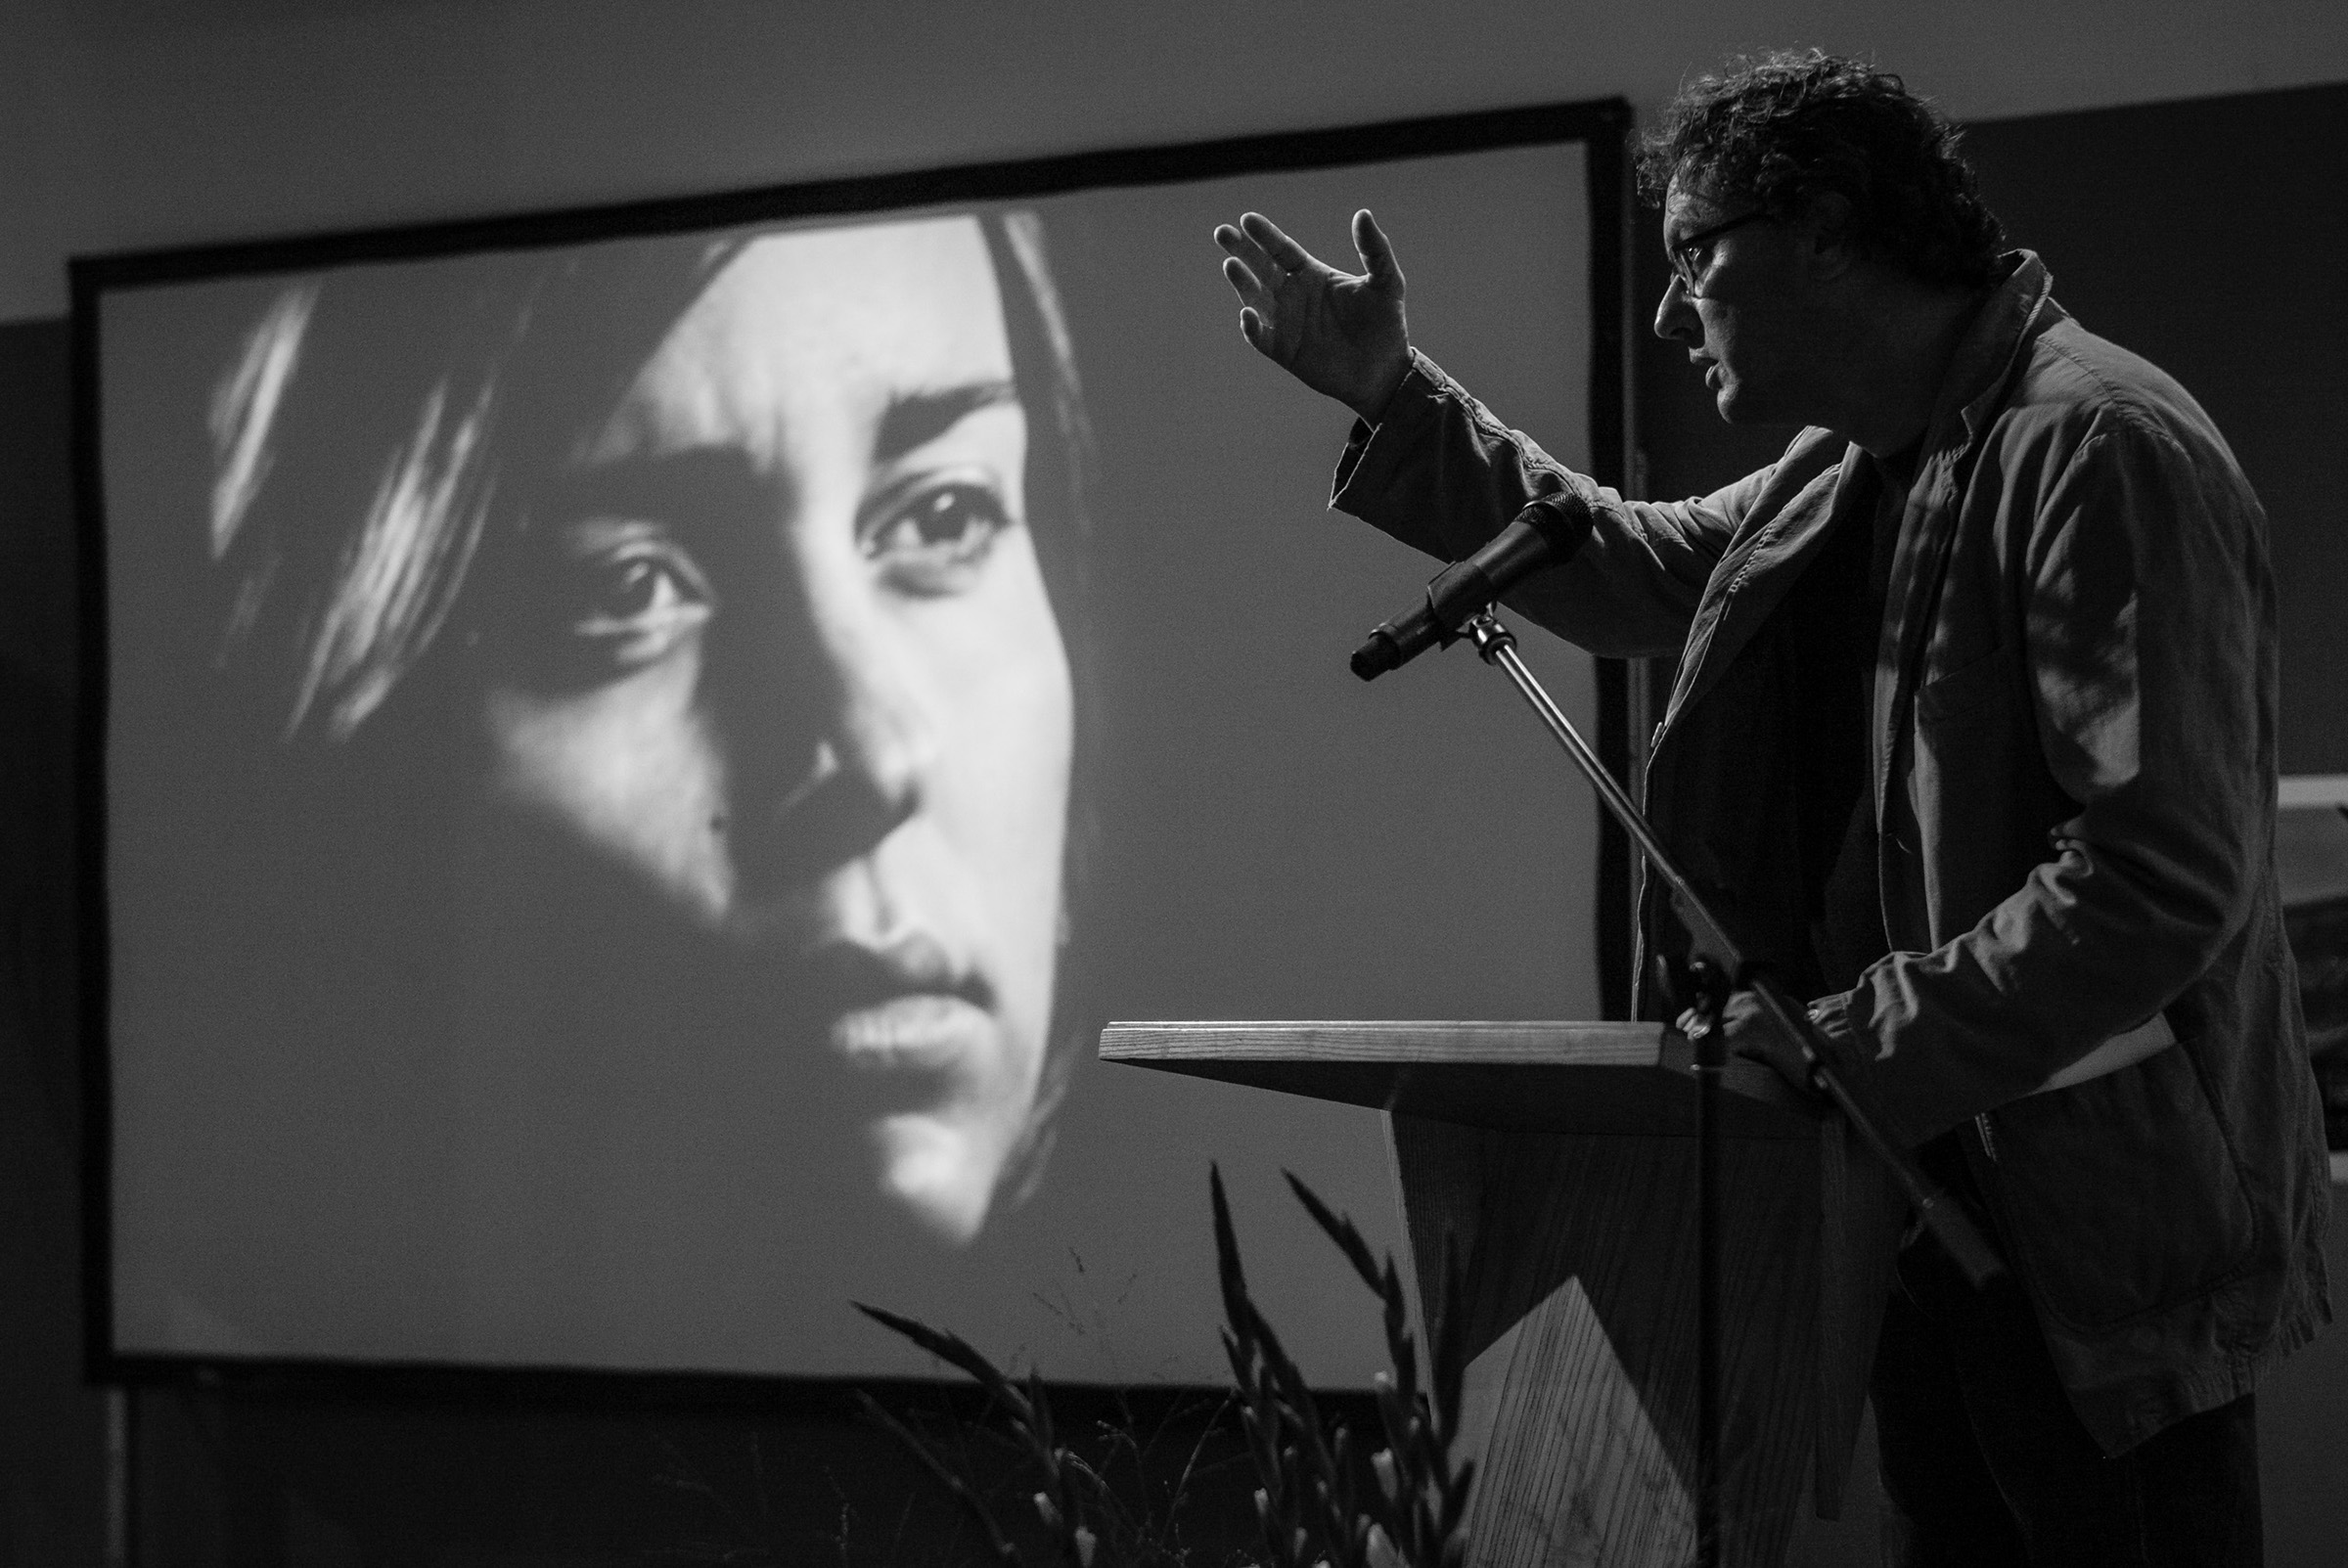 Preisvergabe an Paolo Pellegrini, Foto: Herbert Piel